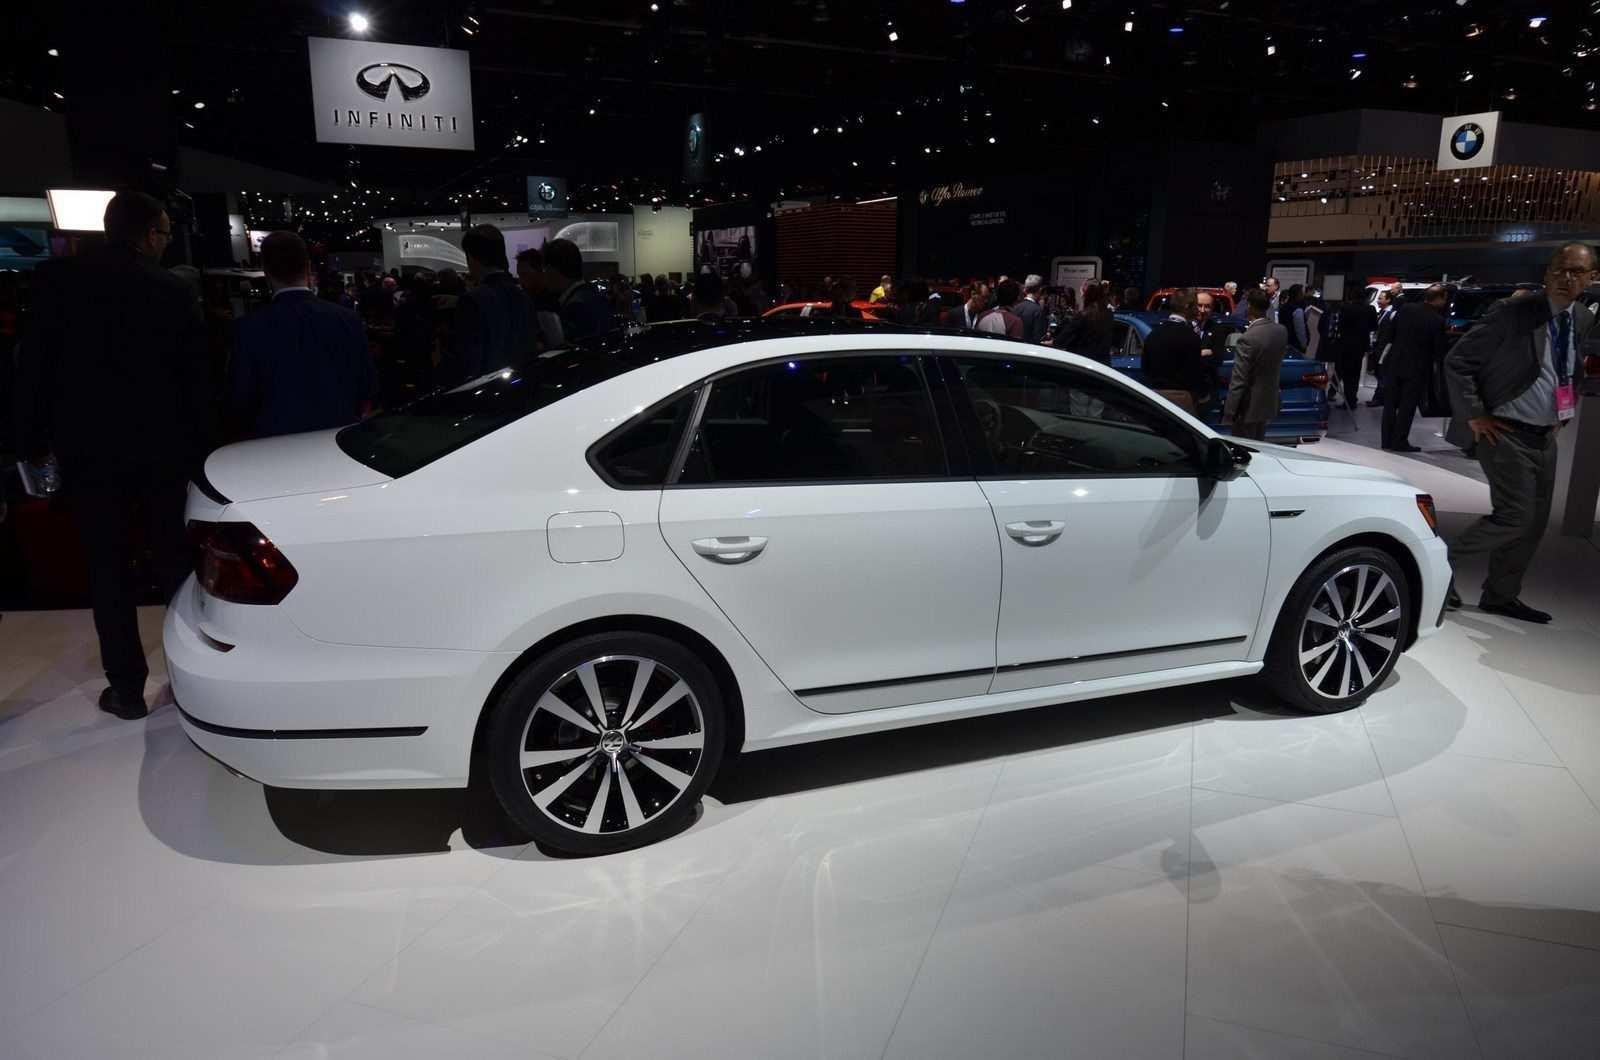 92 All New 2020 VW Passat Gt Reviews with 2020 VW Passat Gt